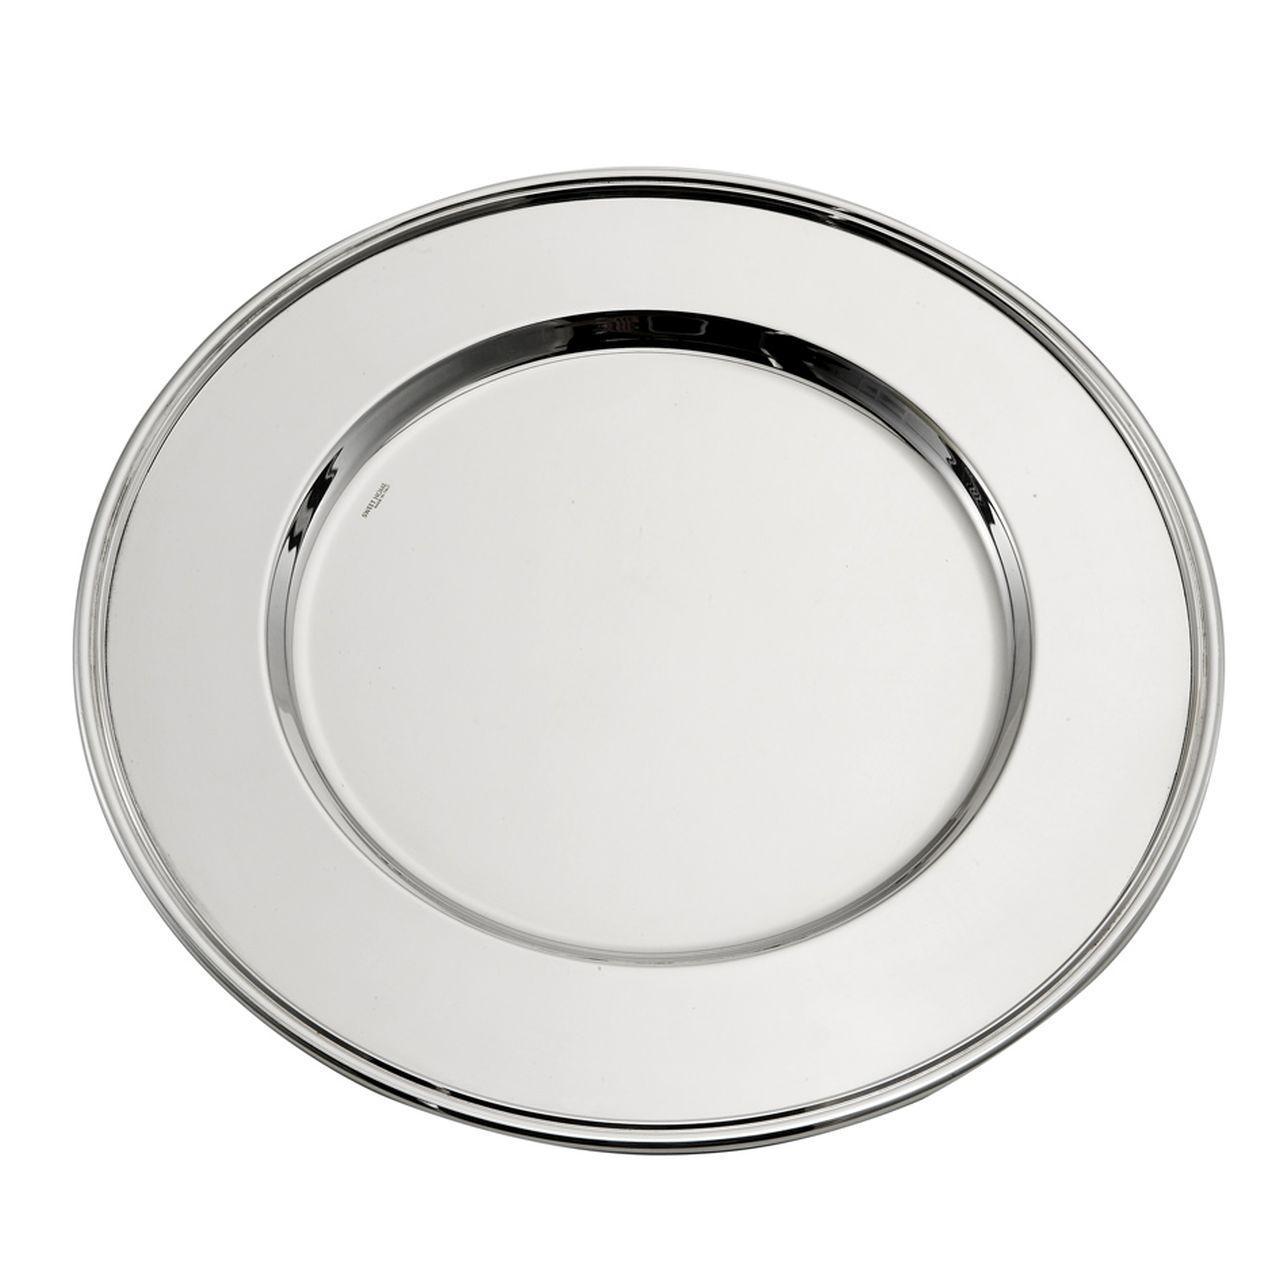 Sottopiatto bordo saldato stile Inglese argentato argento sheffield cm.diam.38